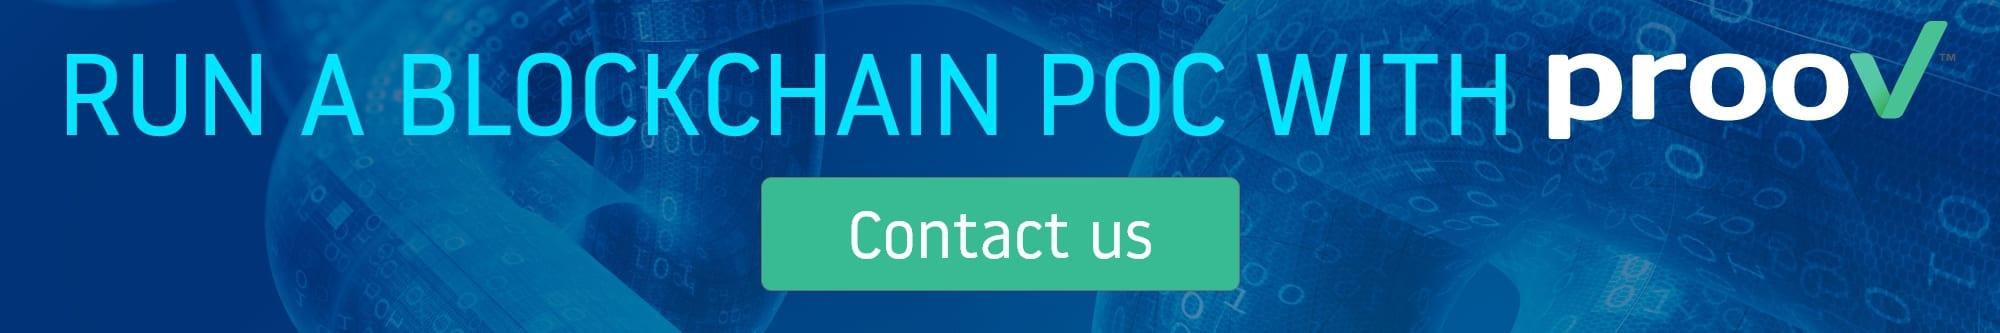 Blockchain PoC - contact prooV